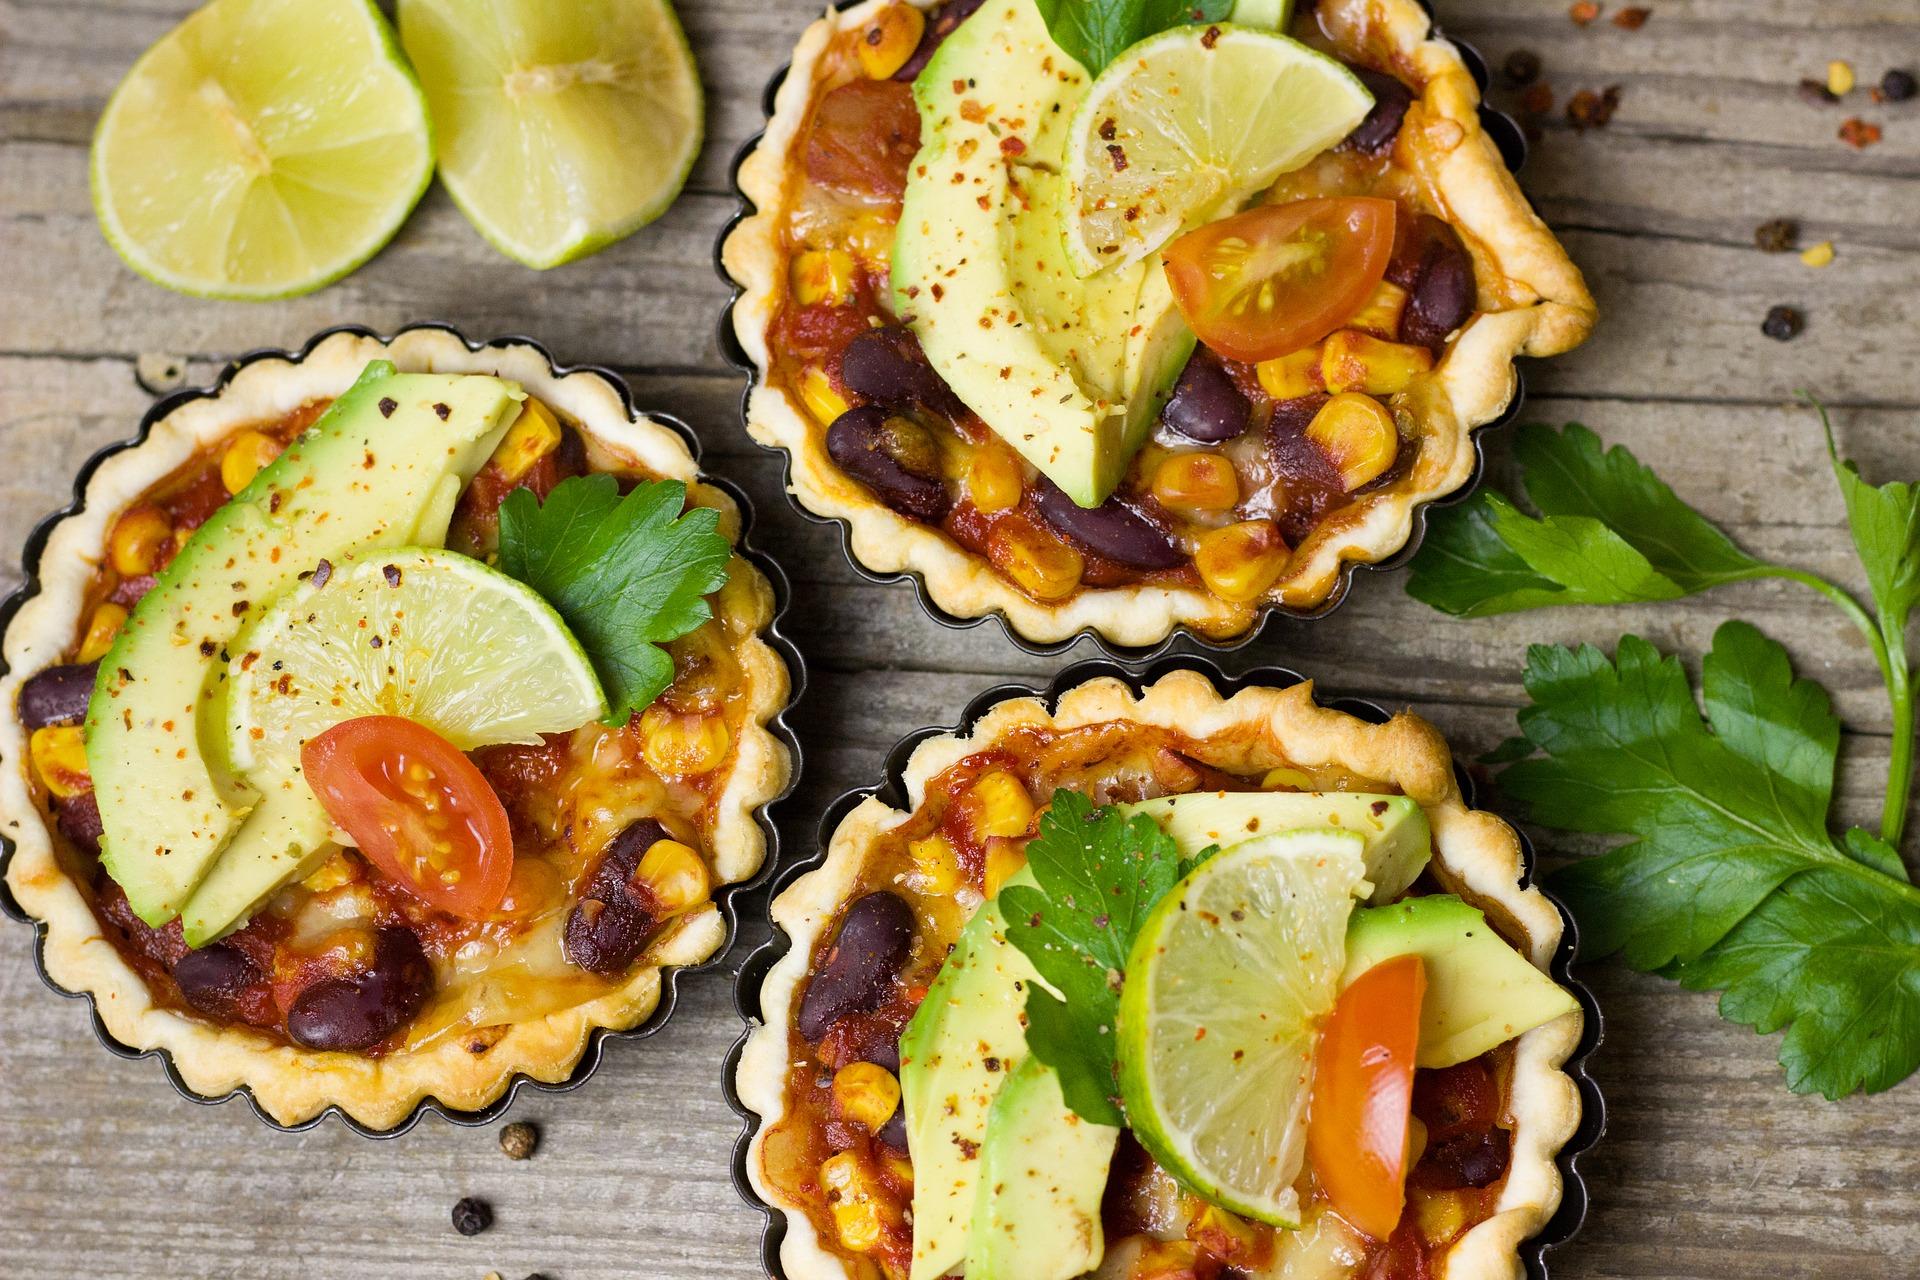 Guide to a Healthier Cinco de Mayo